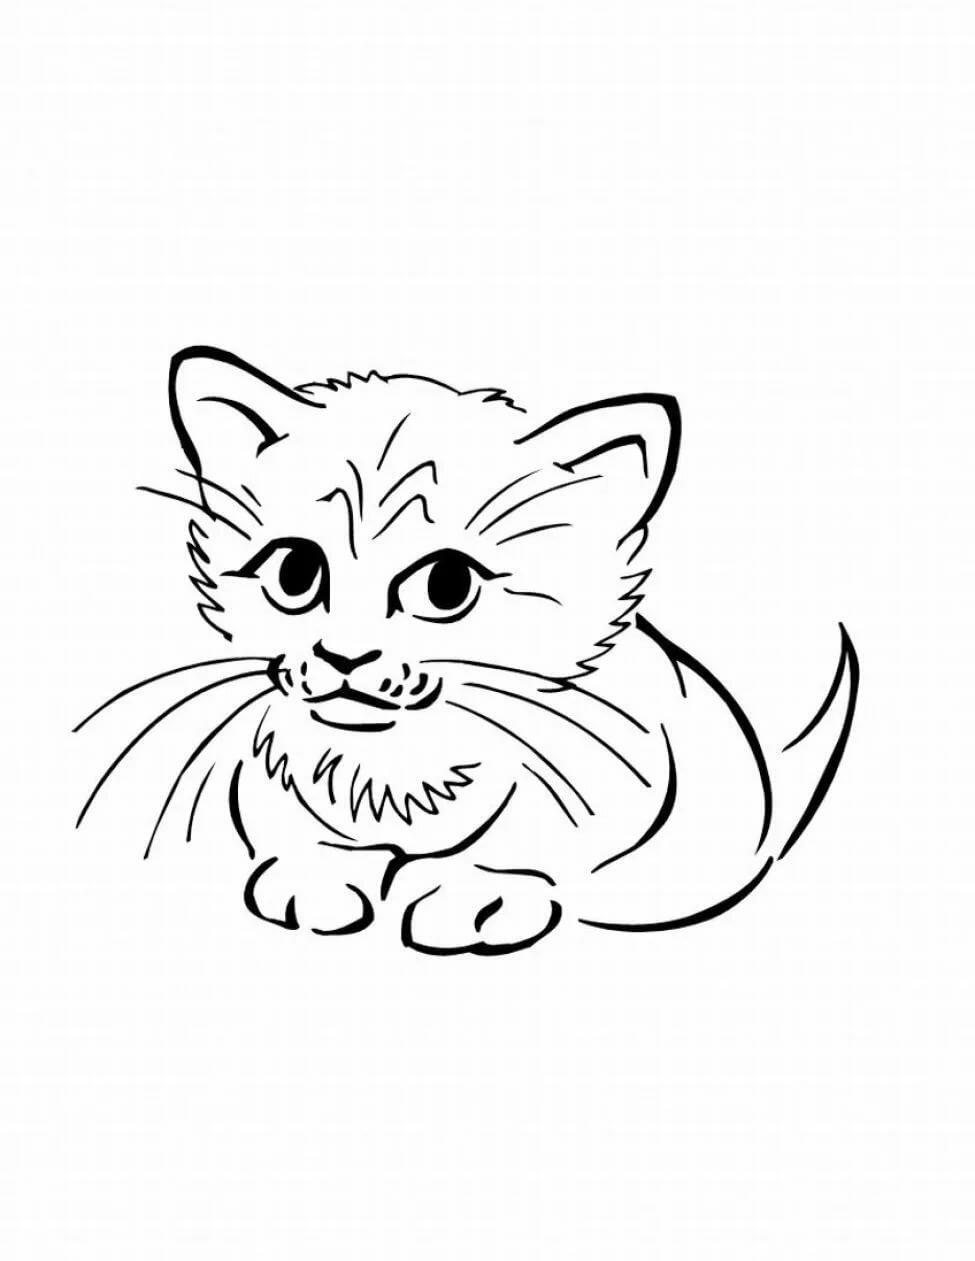 рисунок про котенка маленький